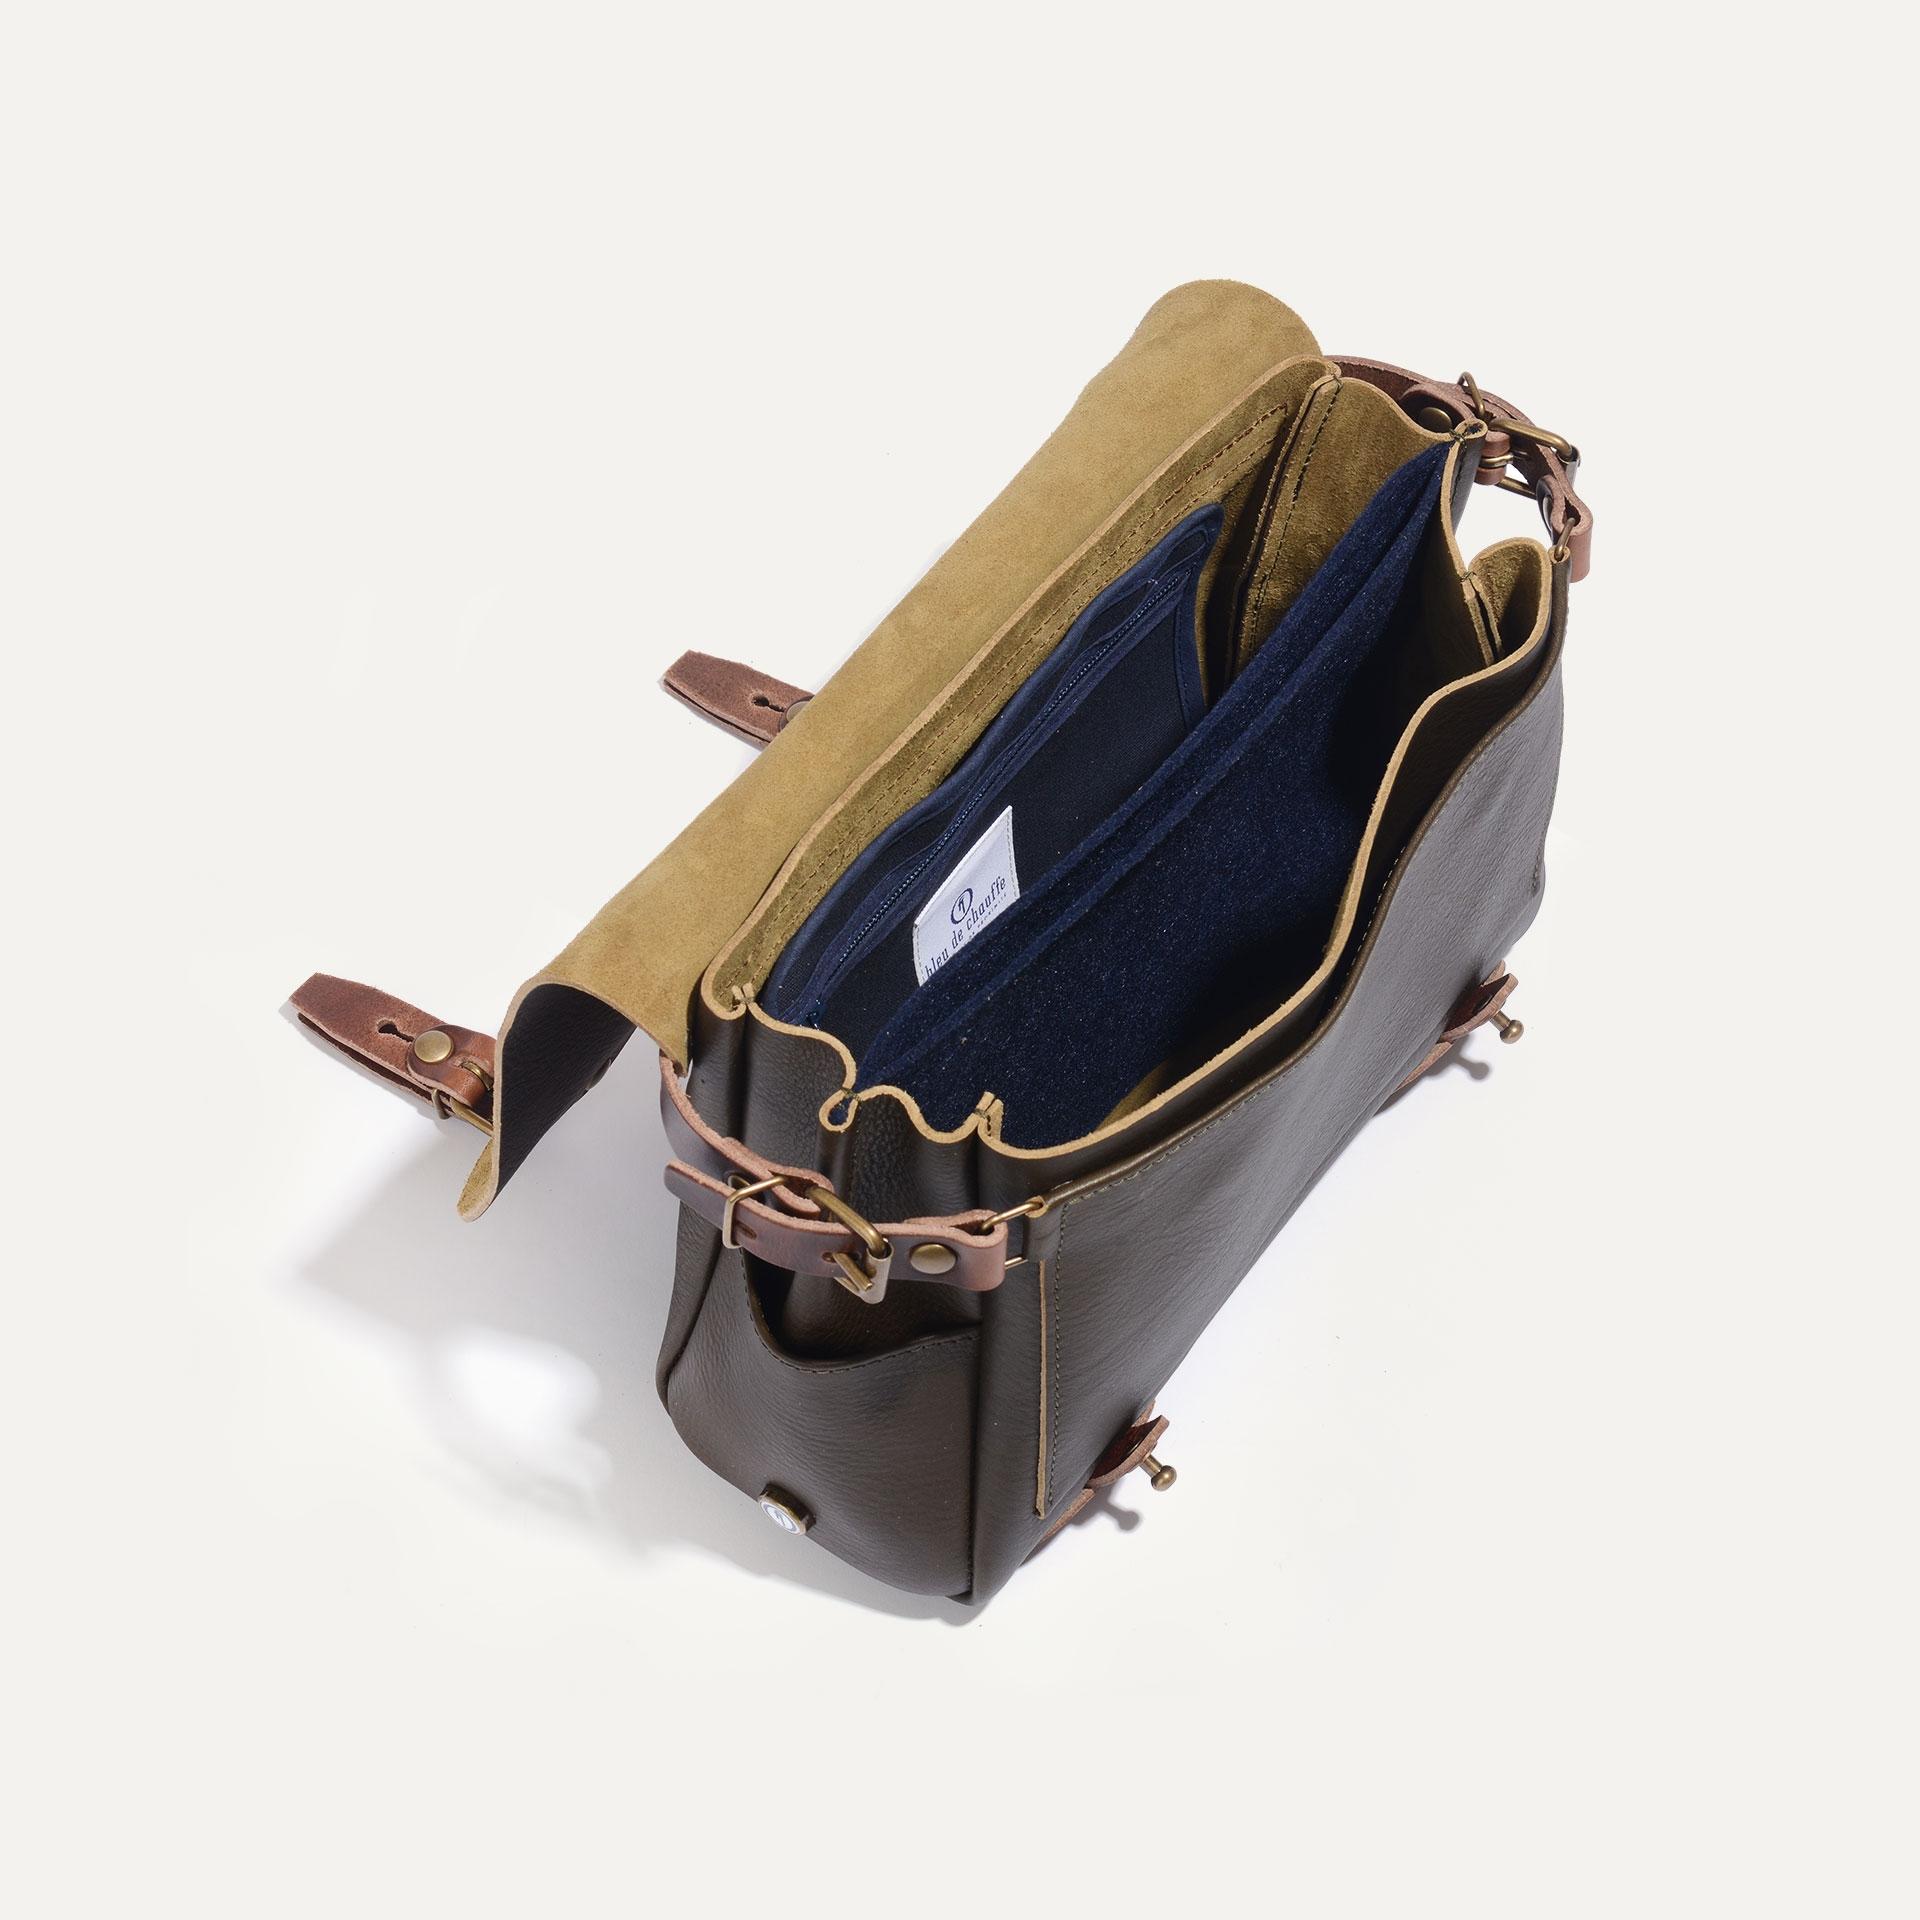 Postman bag Éclair S - Khaki (image n°4)